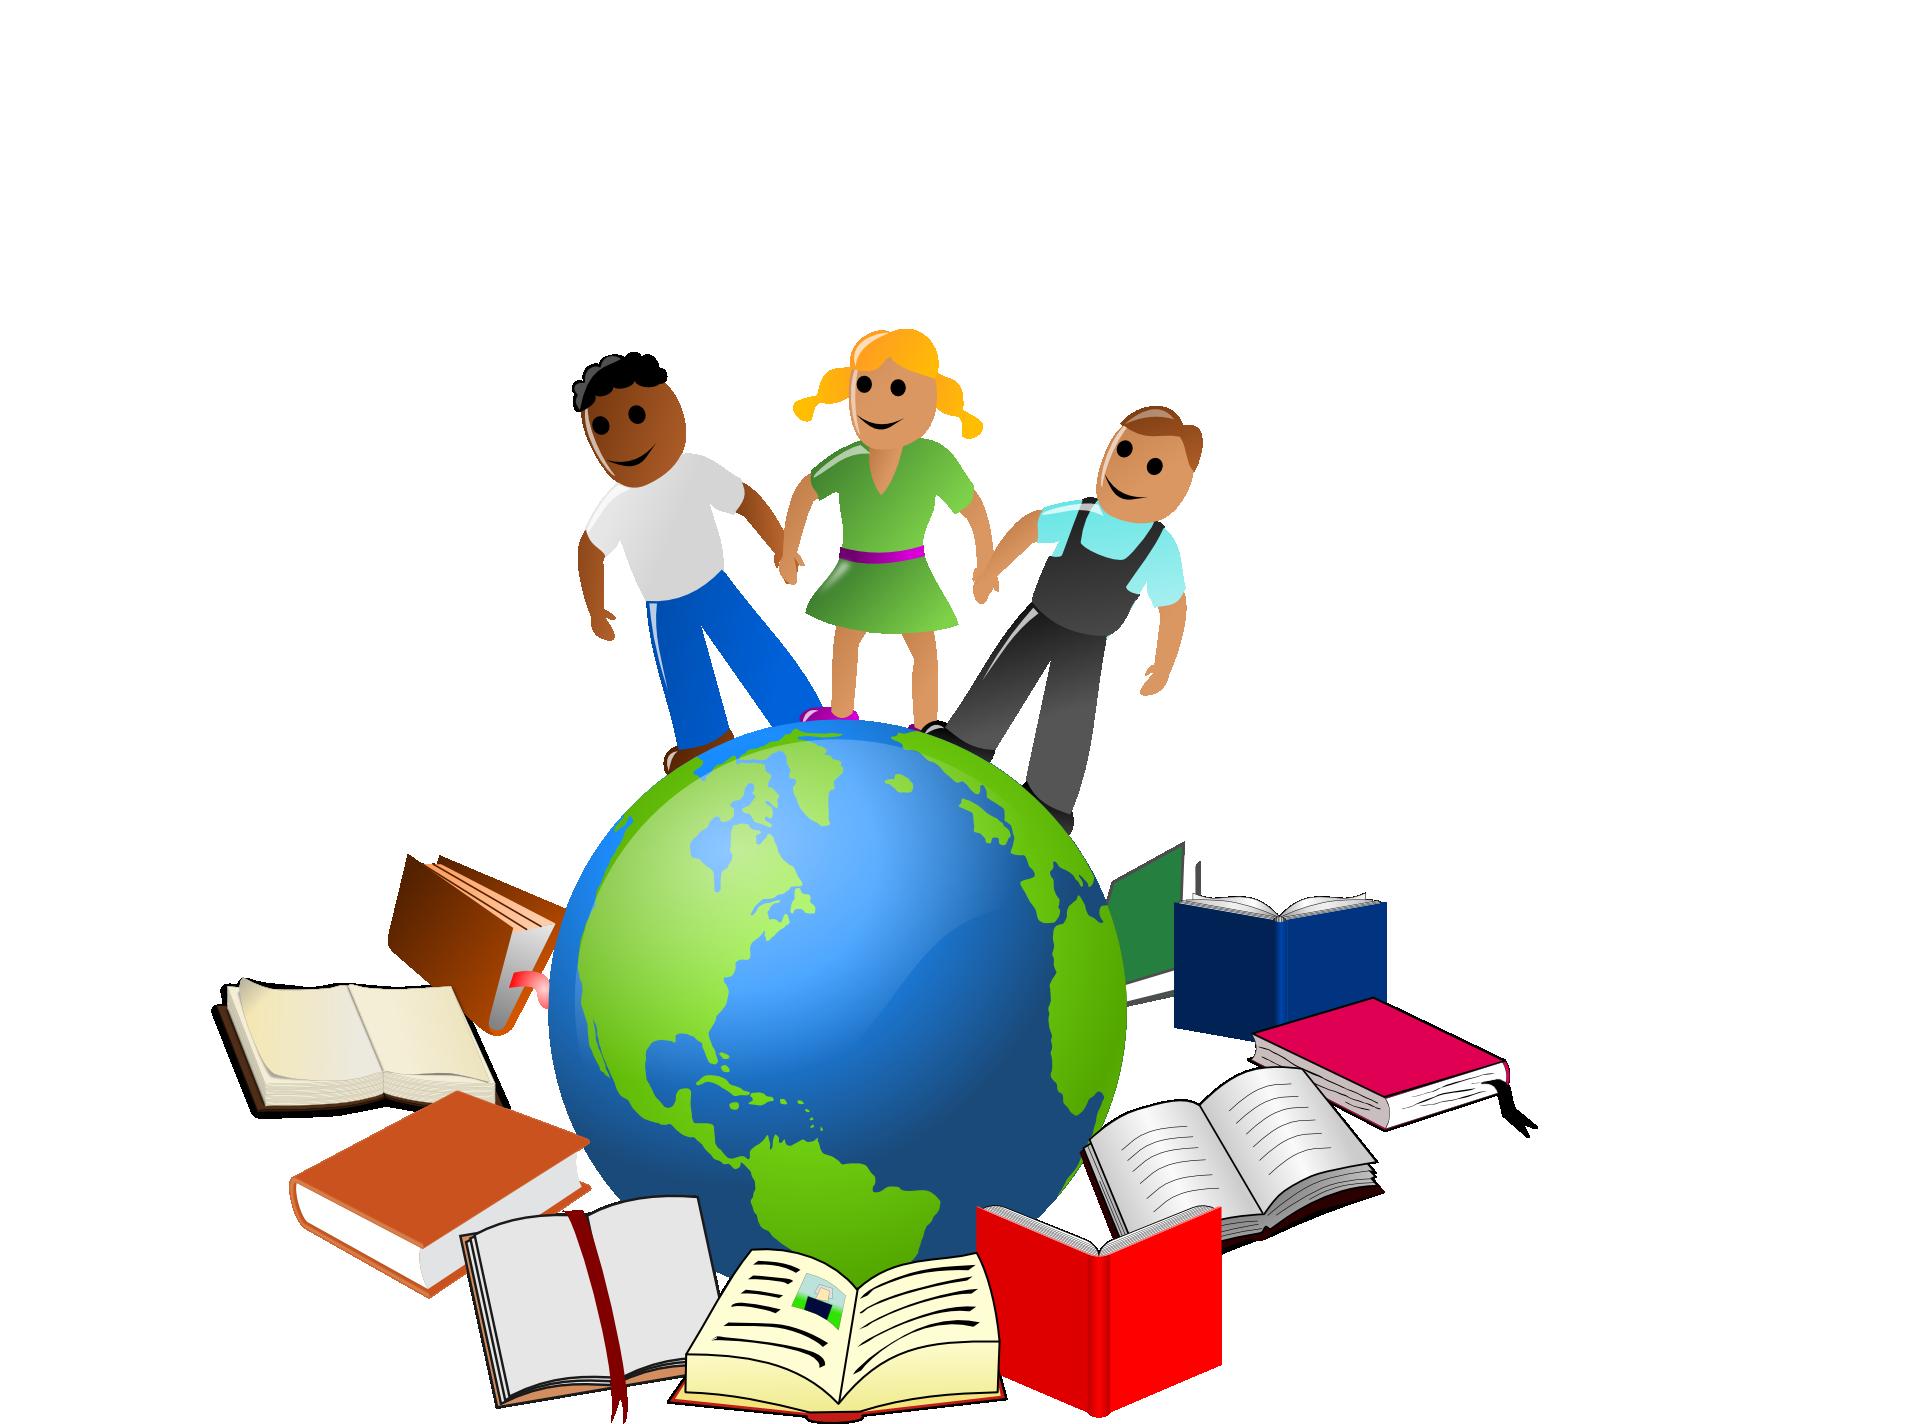 September norah colvin httppixabaycomendiversityethnicglobal. Conflict clipart literary